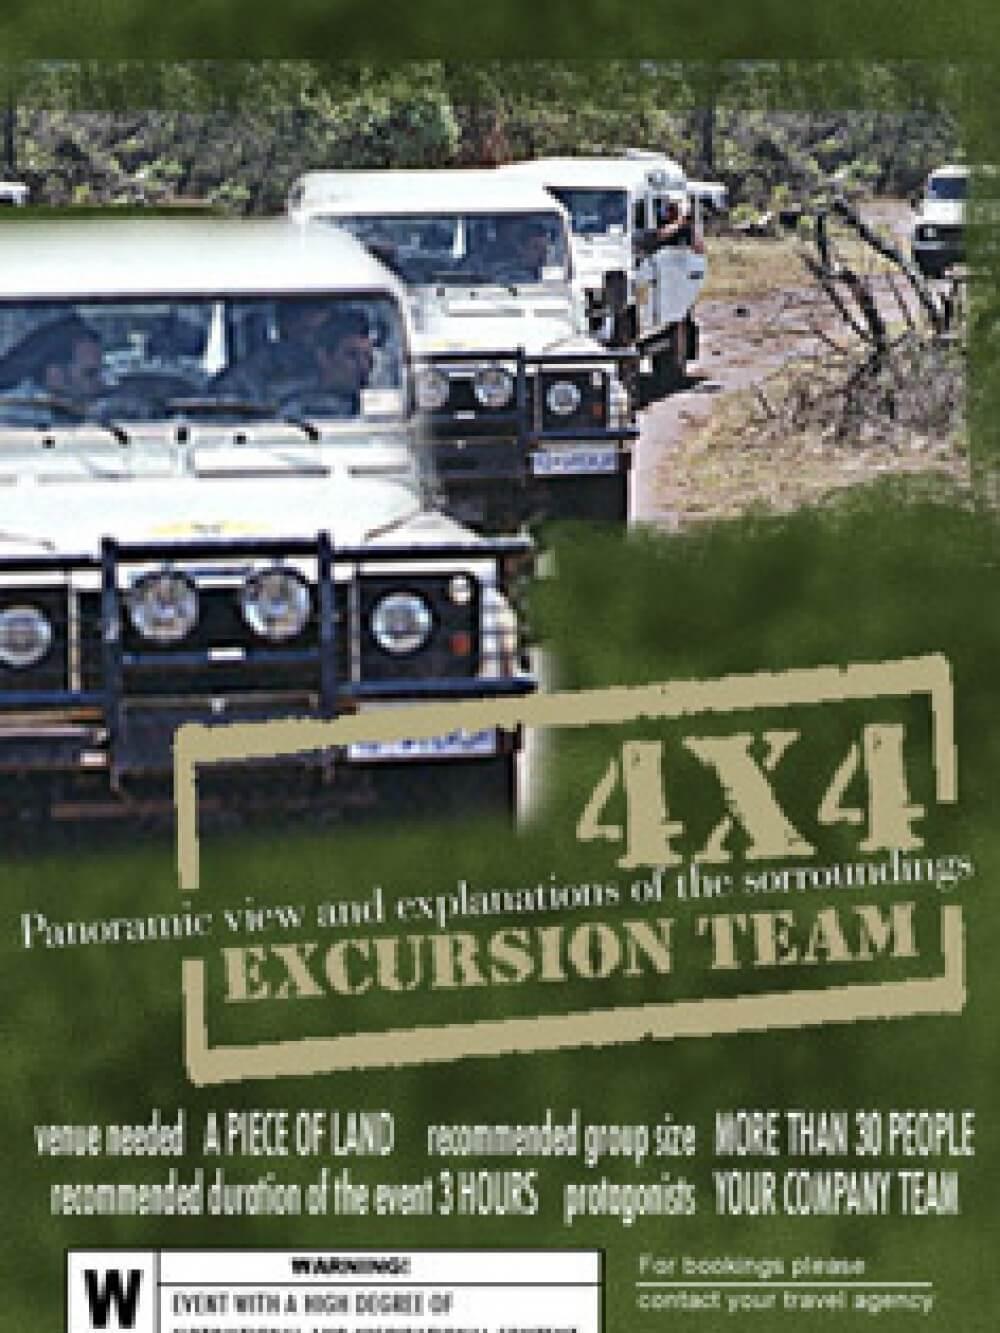 4x4_excursion_team_vertical_web